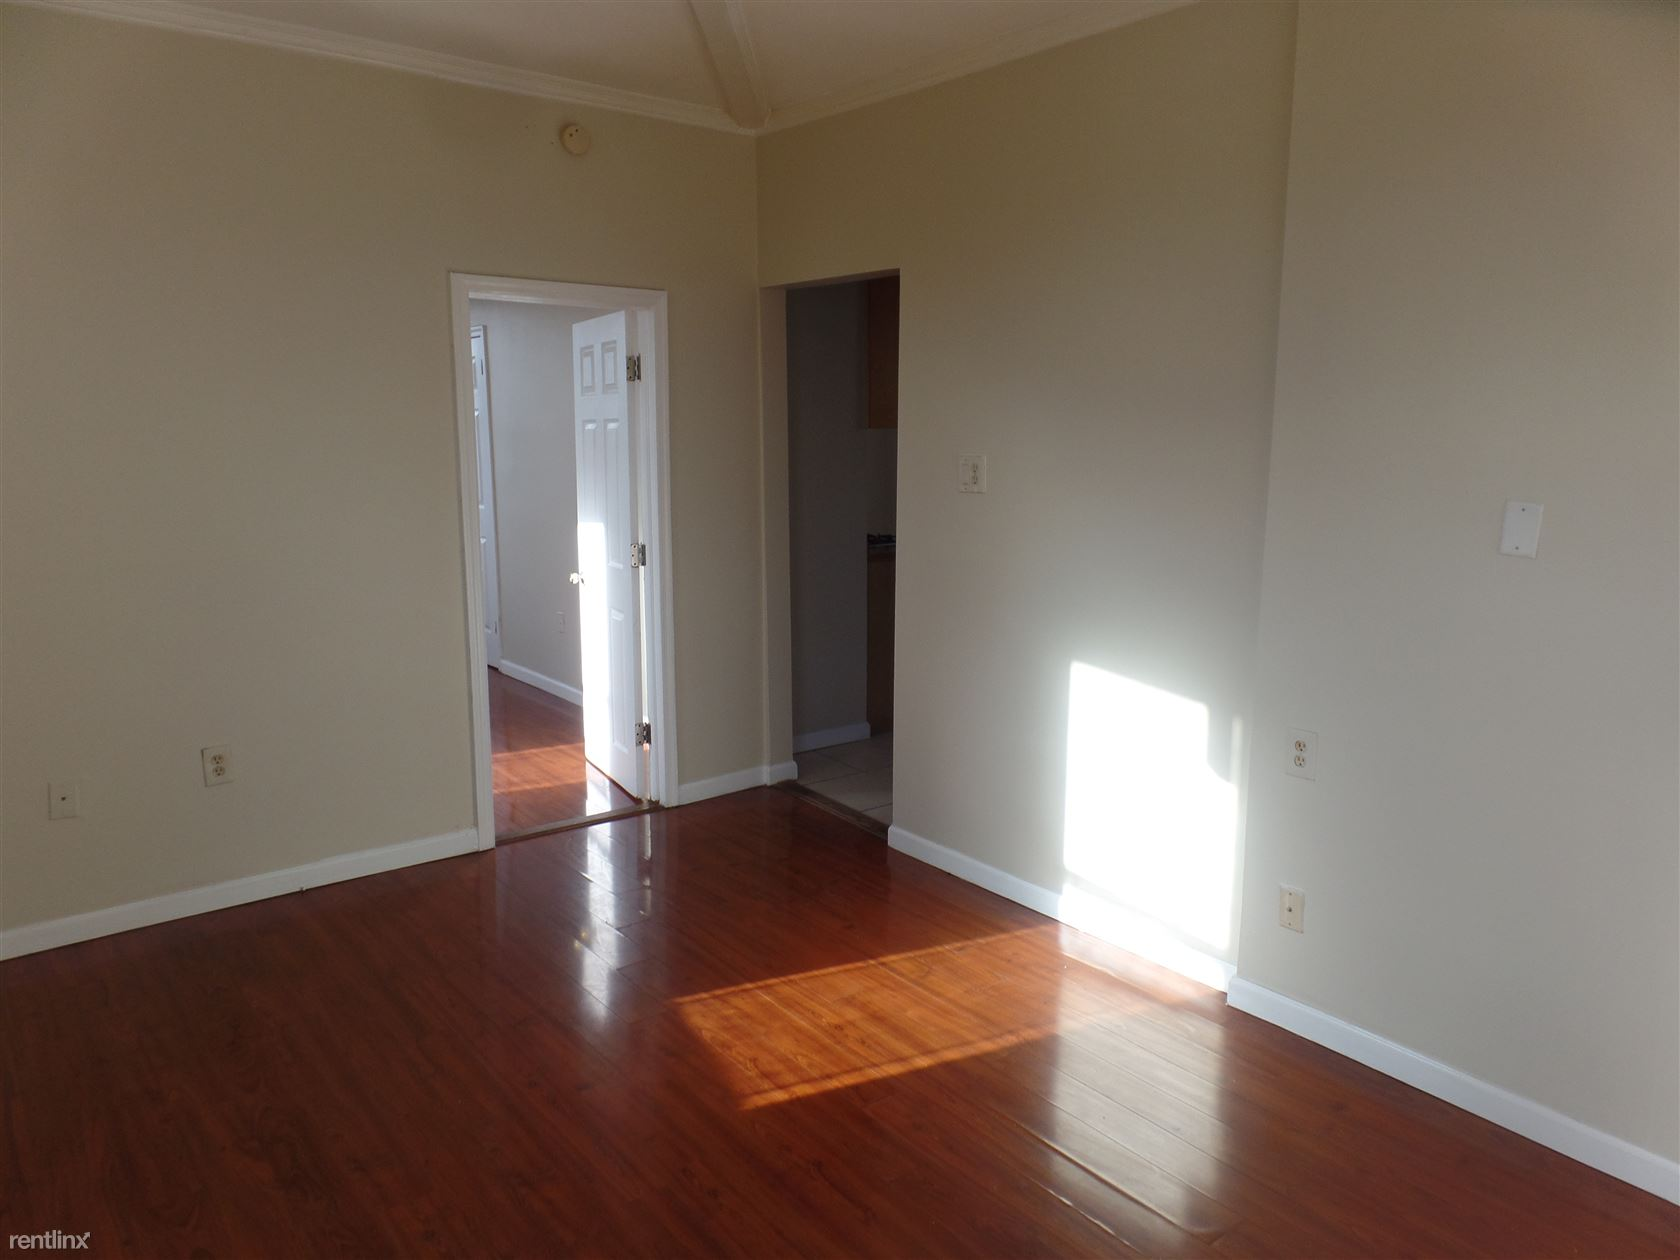 frbo   linden  nj  united states houses for rentowner   rental. 2 Bedroom Apartments In Linden Nj For  950 awesome ideas